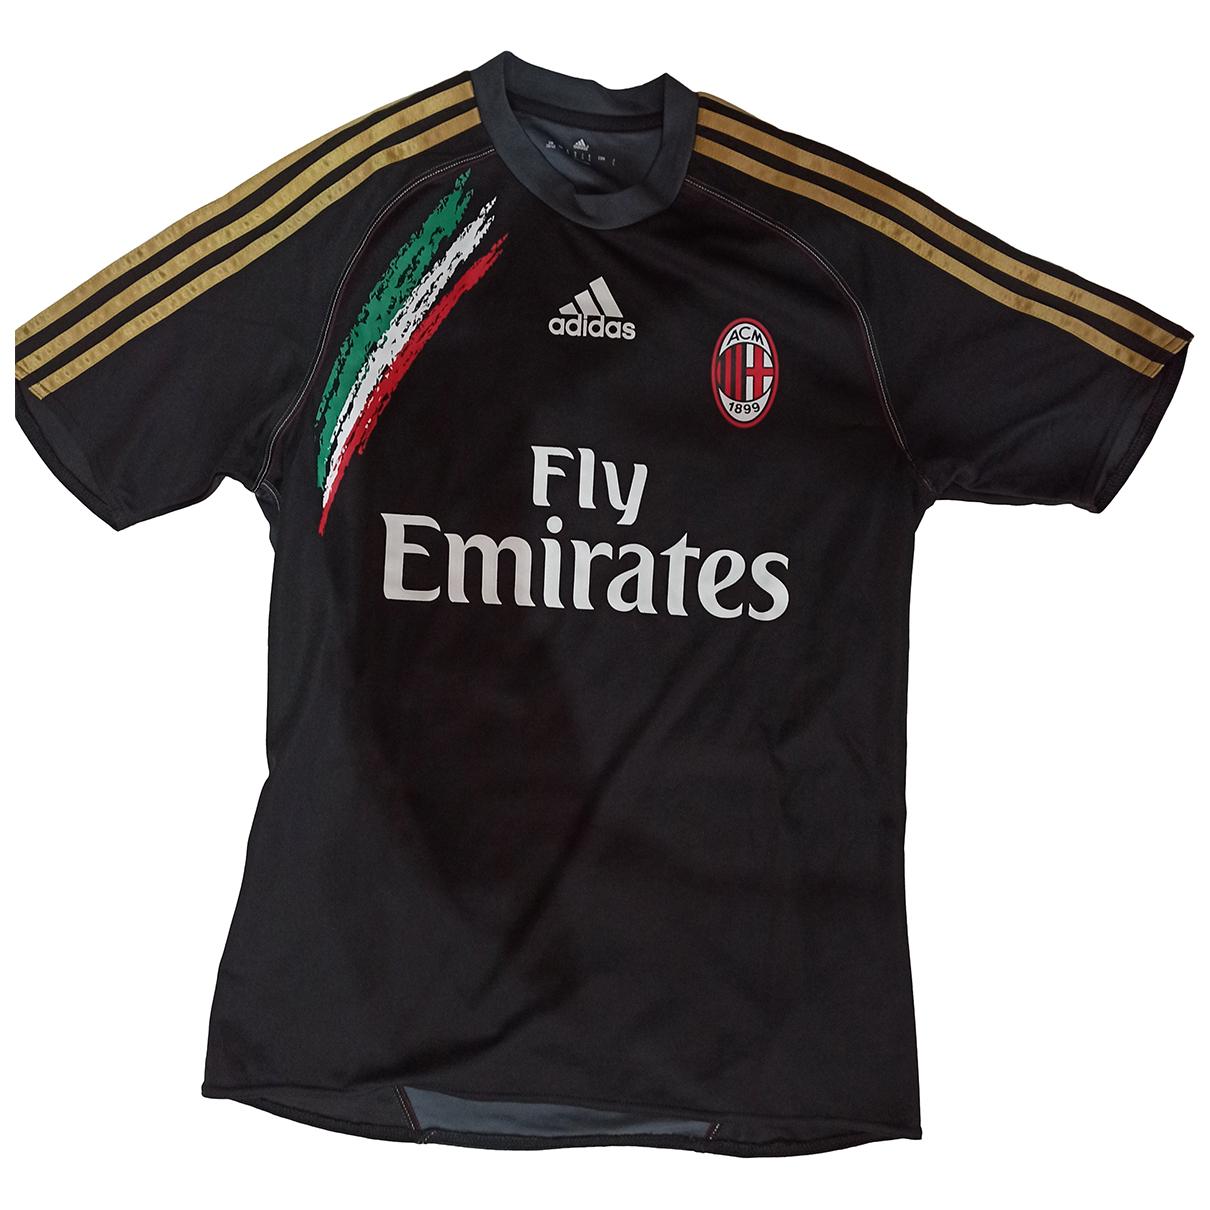 Adidas - Tee shirts   pour homme - noir